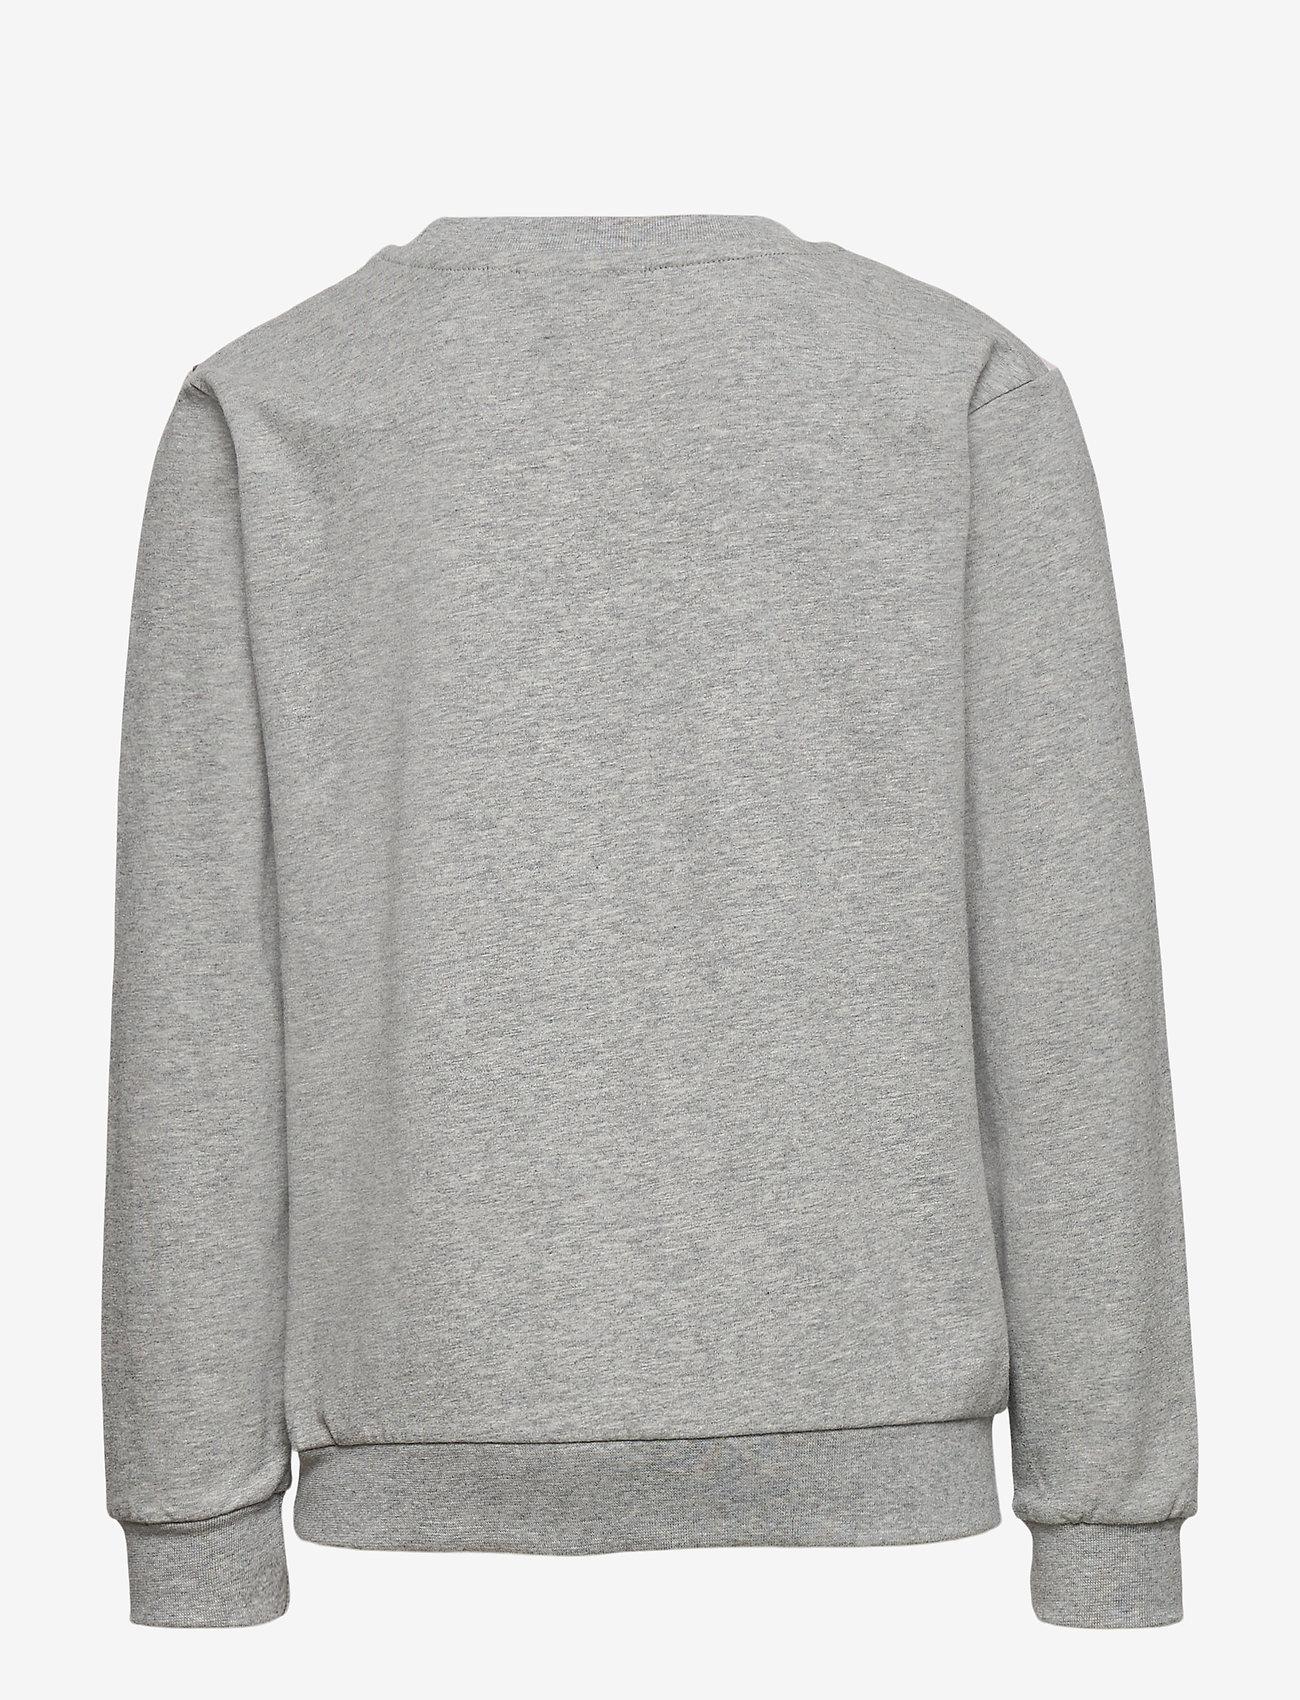 Molo - Regine - sweatshirts - tout le monde - 1